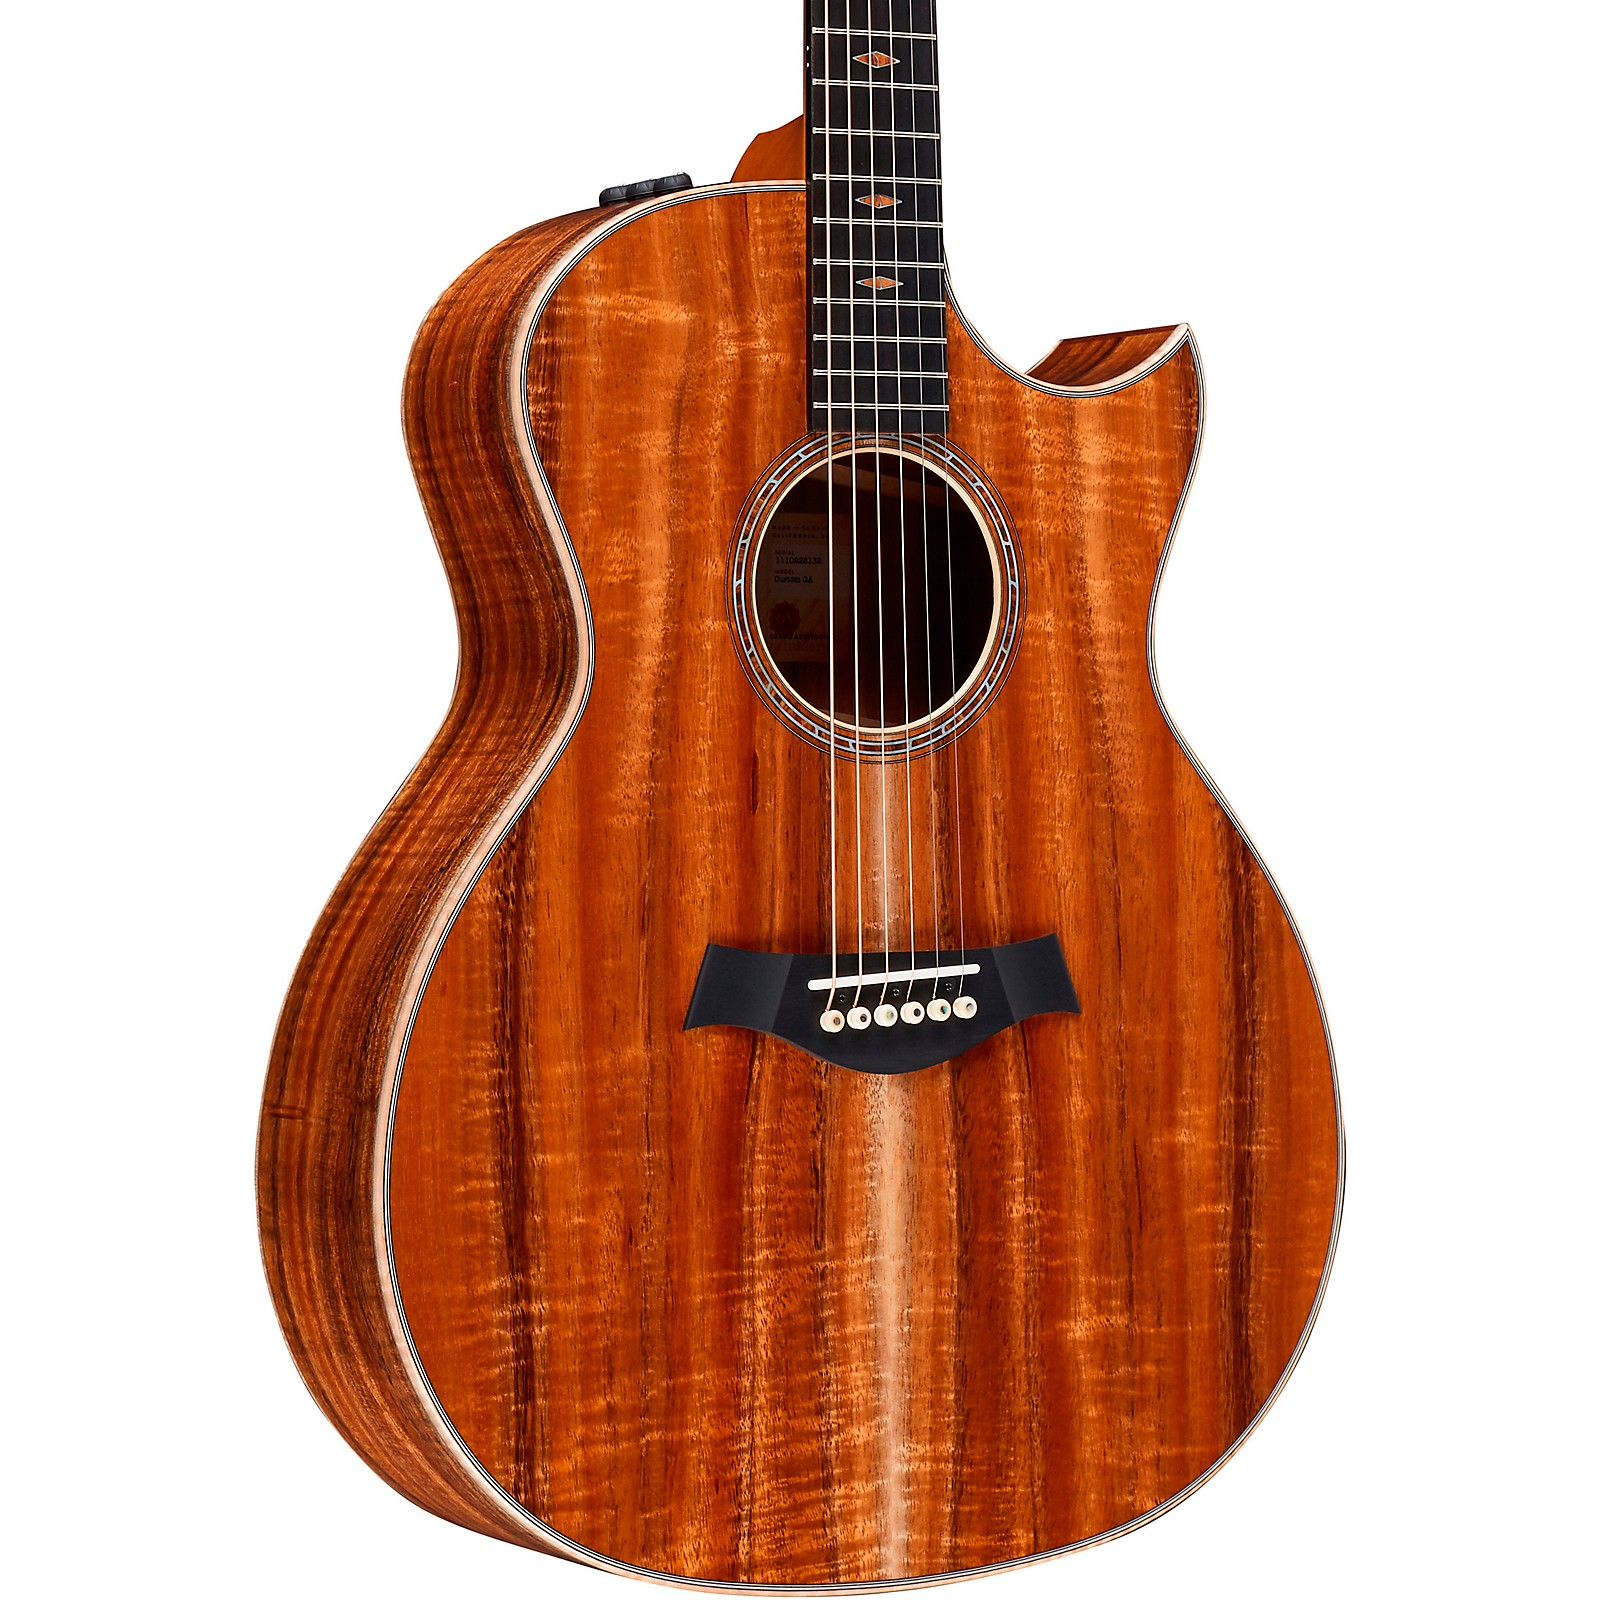 Taylor Custom Grand Auditorium V-Class #11161 Figured AA-Grade Koa Acoustic-Electric Guitar